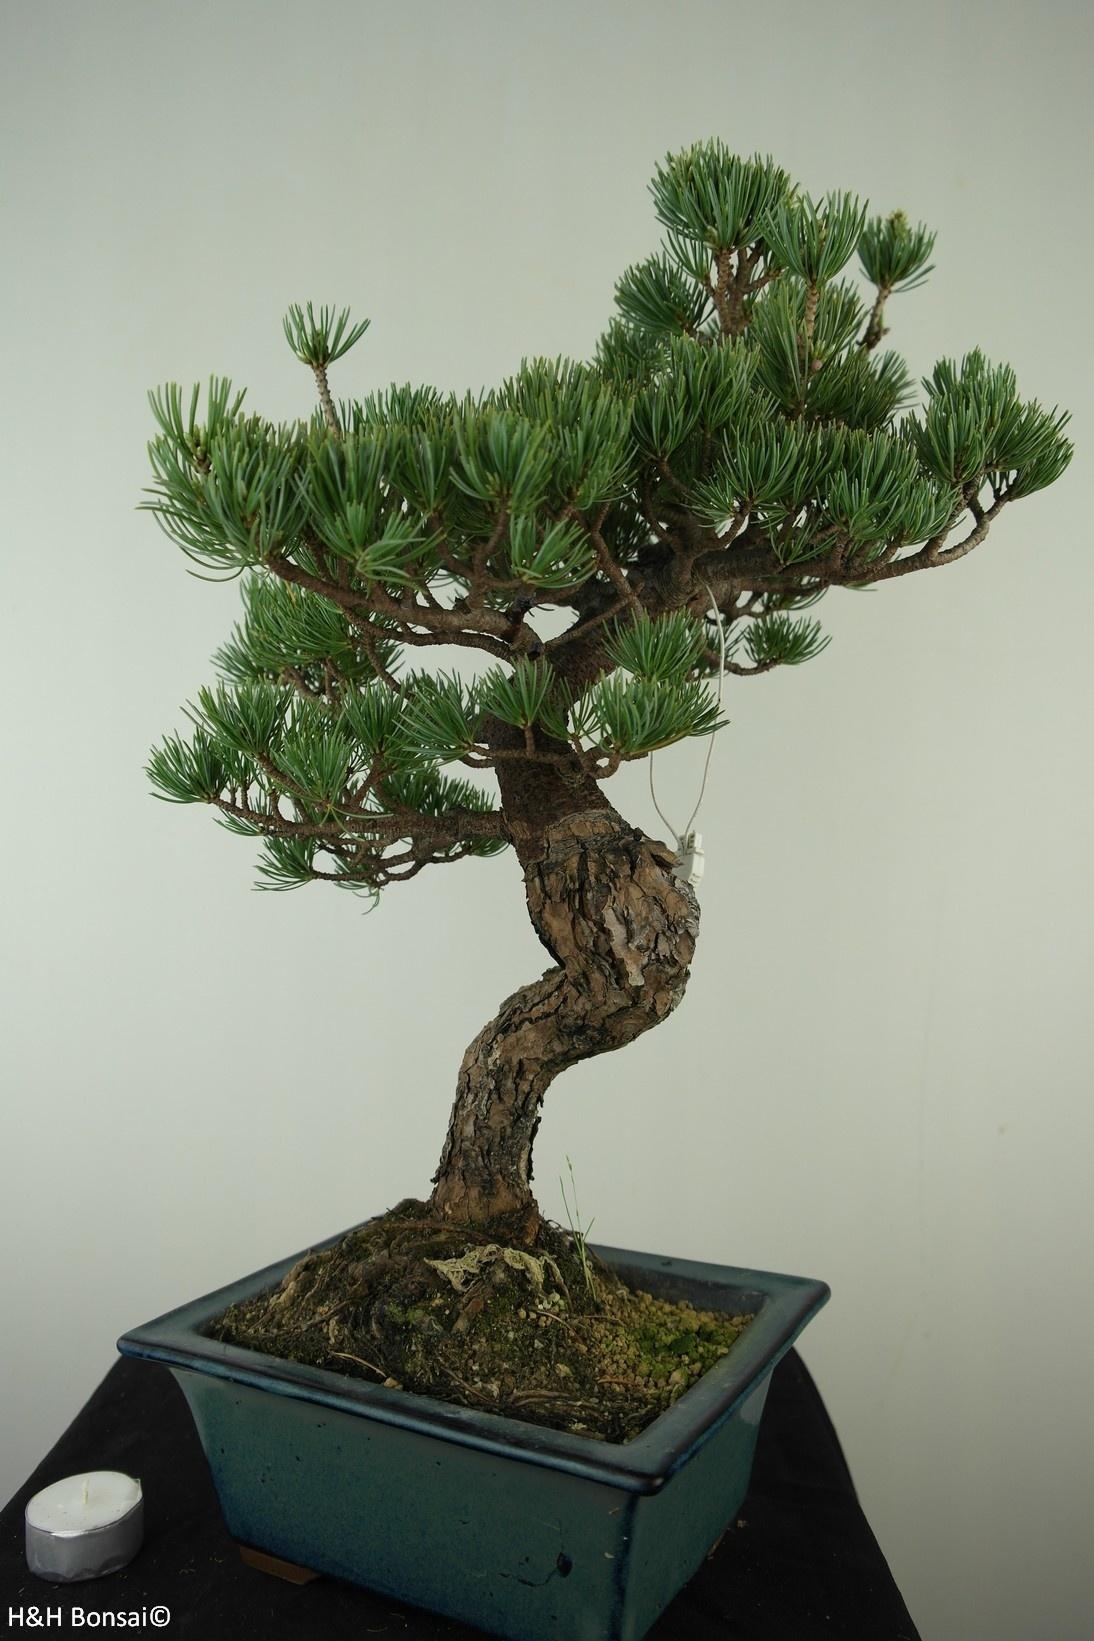 Bonsai Mädchenkiefer, Pinus pentaphylla, nr. 7809